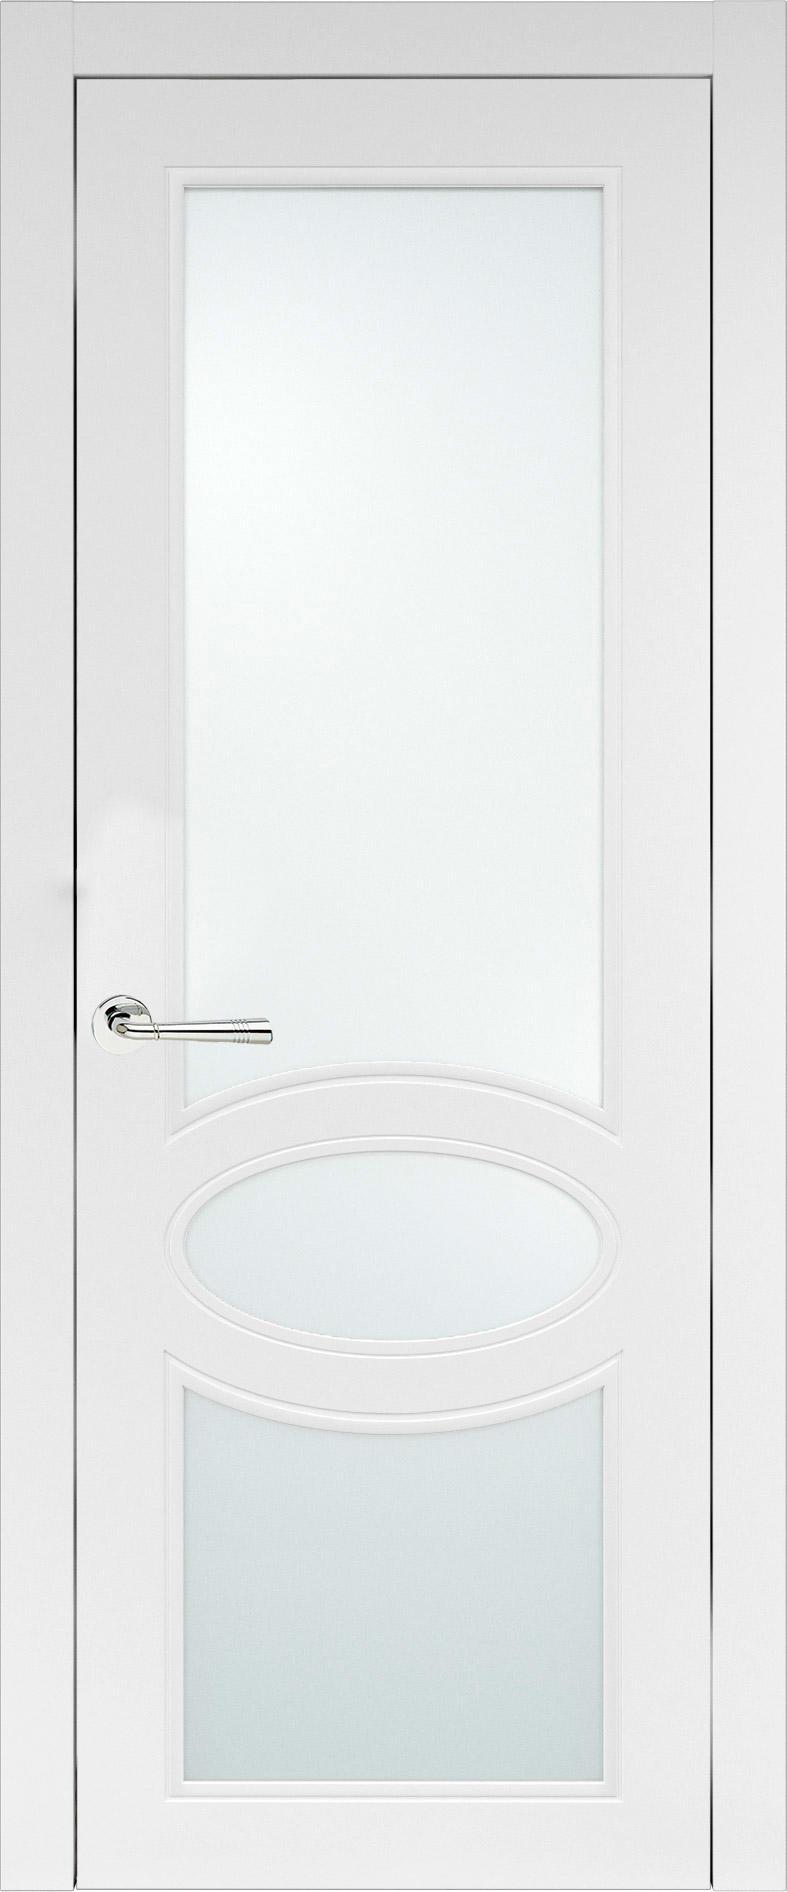 Florencia Neo Classic цвет - Белая эмаль (RAL 9003) Со стеклом (ДО)